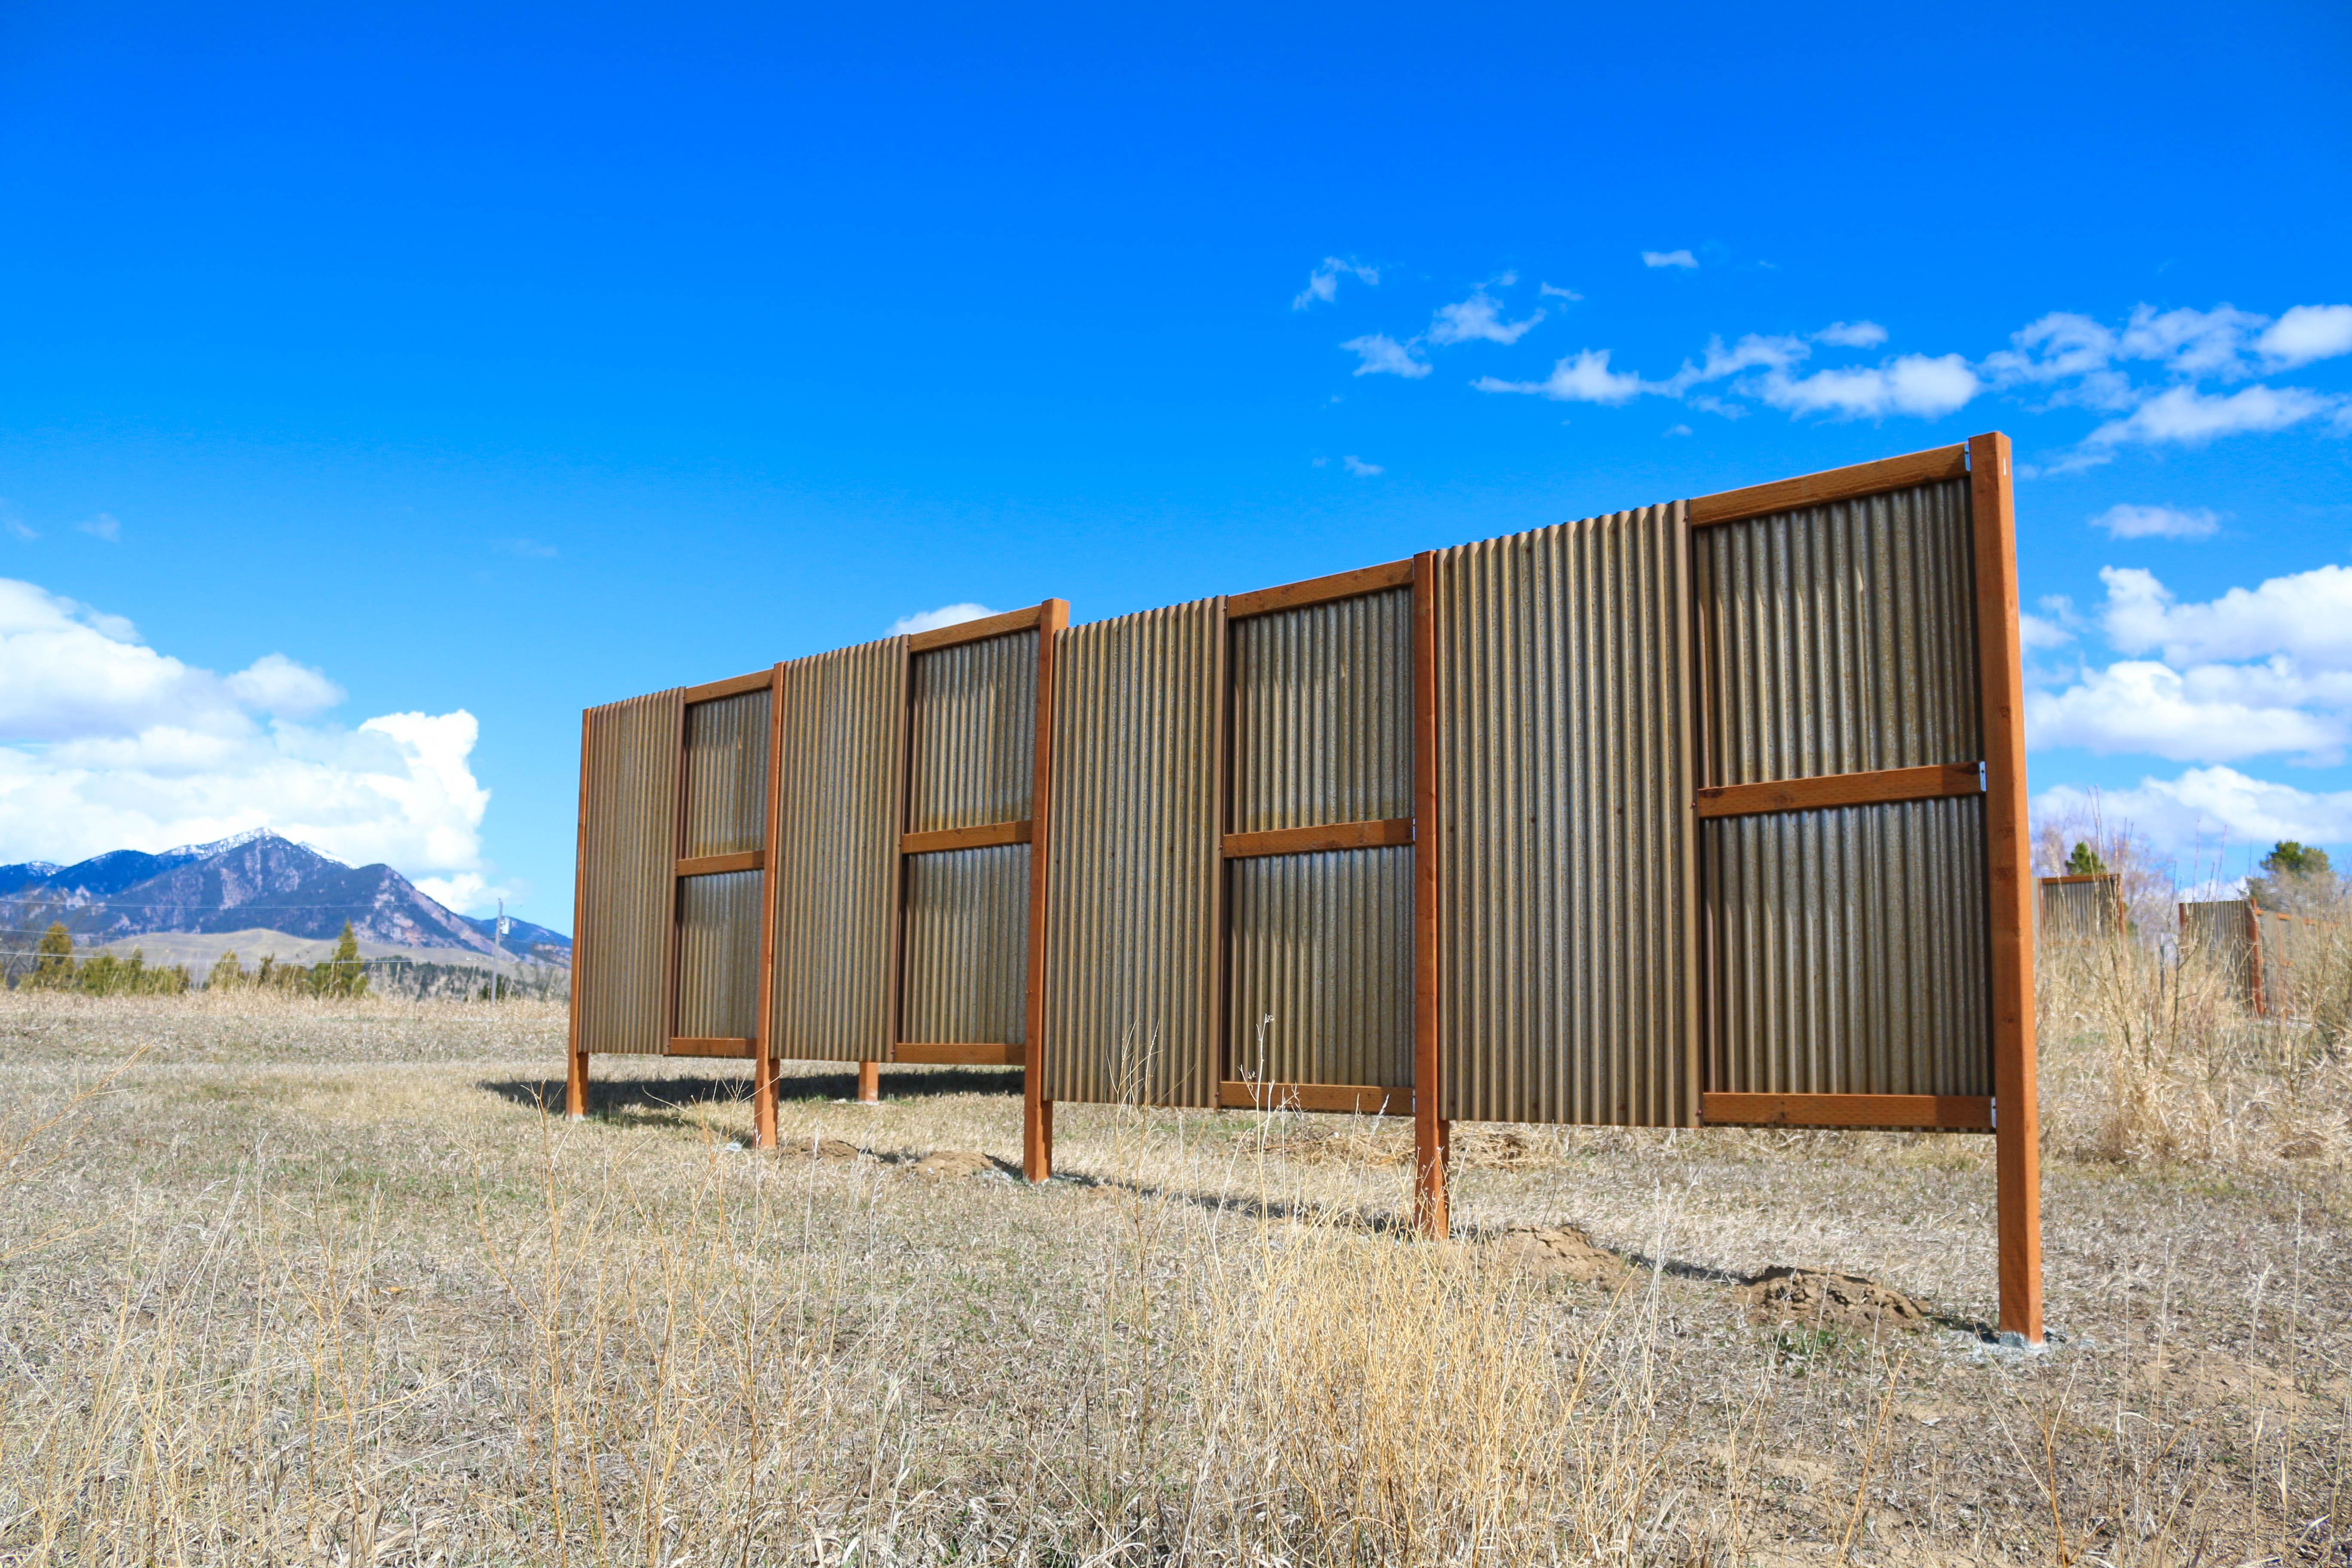 Rusted Corrugated Windbreak Fencing